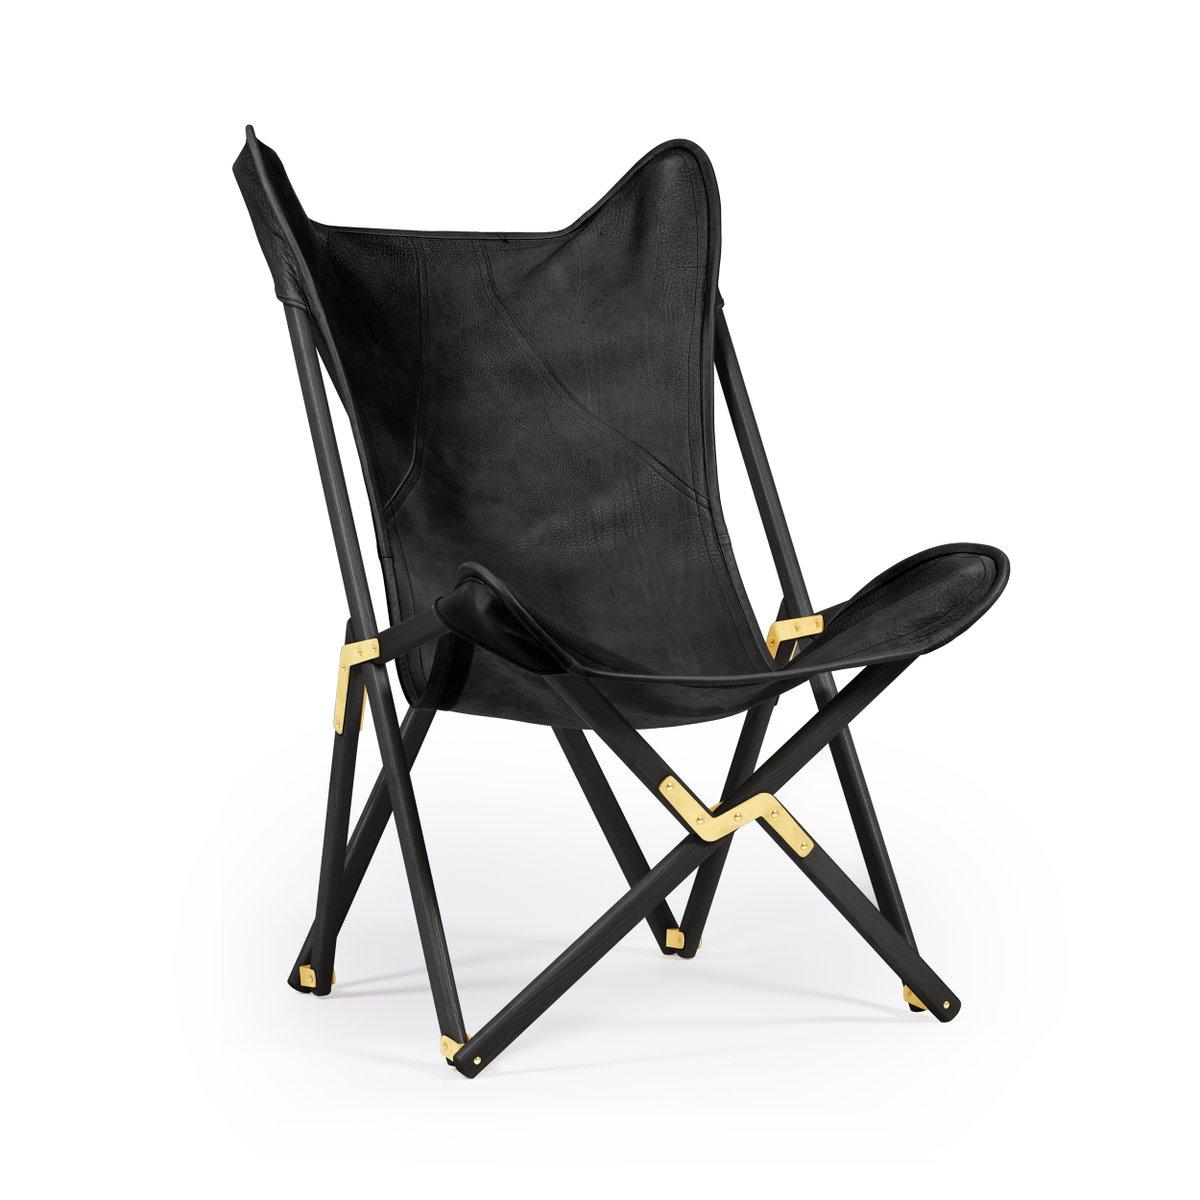 chaise telami tripolina en cuir noir de telami en vente sur pamono. Black Bedroom Furniture Sets. Home Design Ideas